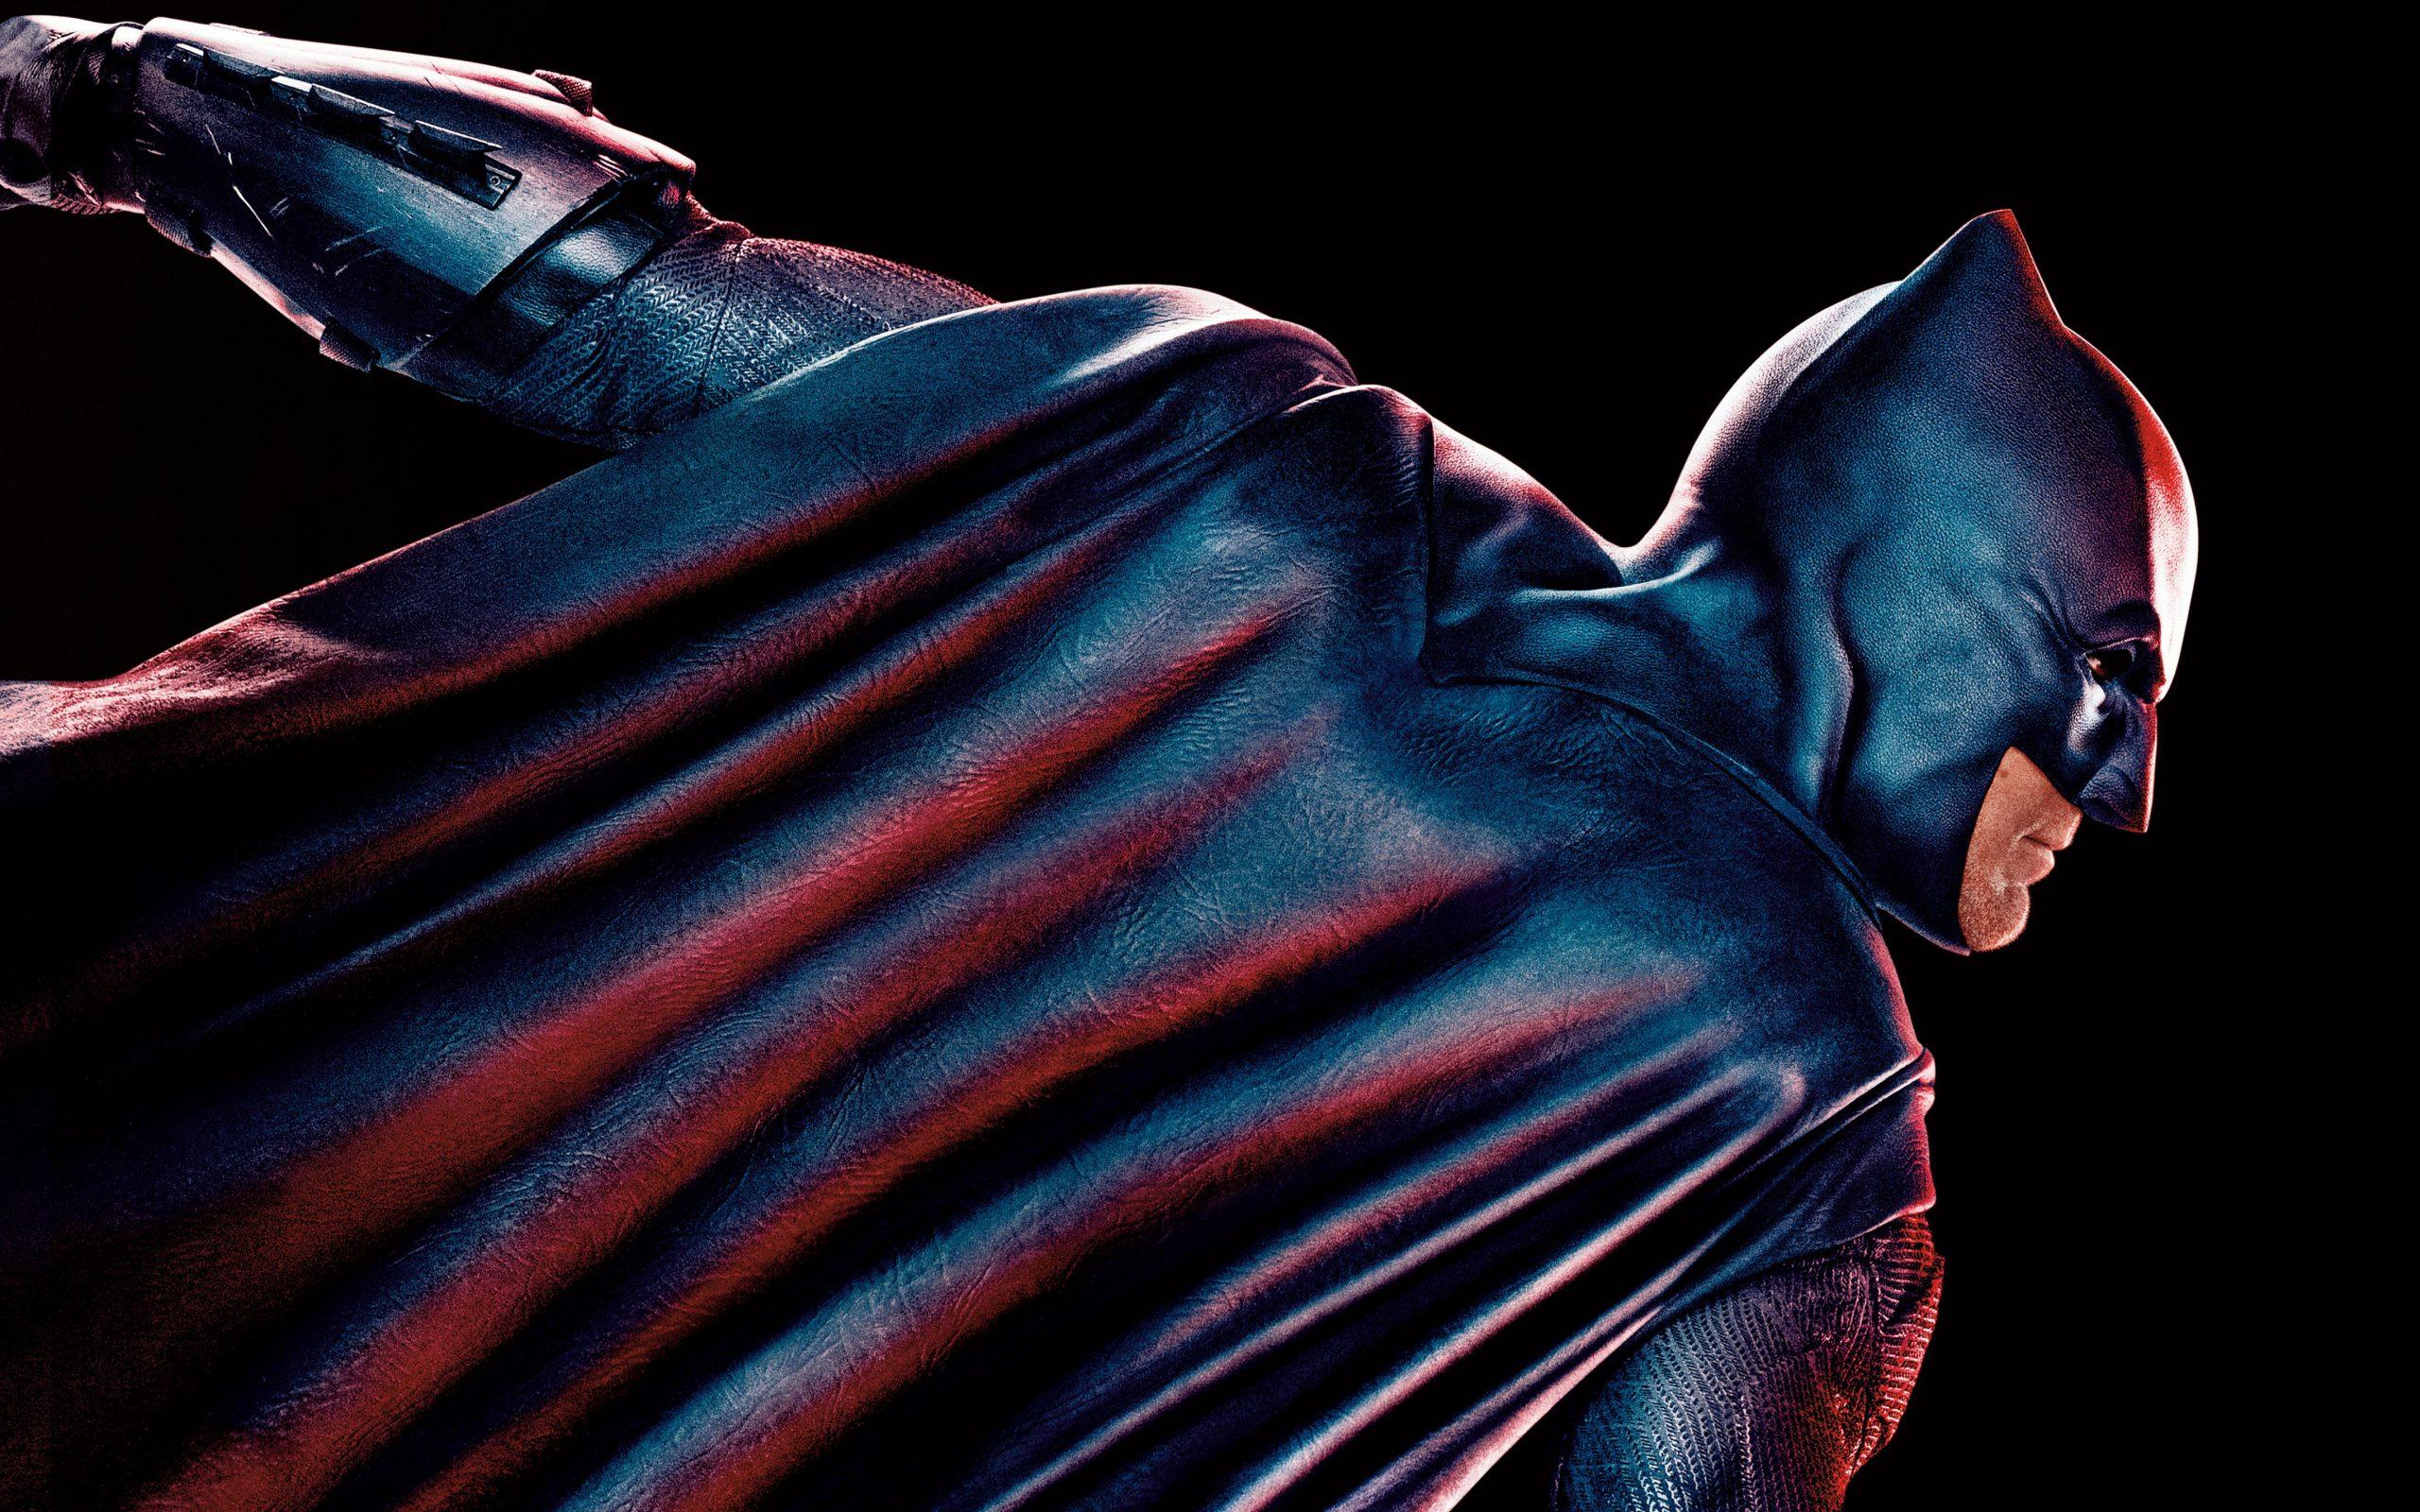 Great Wallpaper Movie Justice League - batman-movie-justice-league-red-5k-wallpaper-2560x1600  Image_833538.jpg